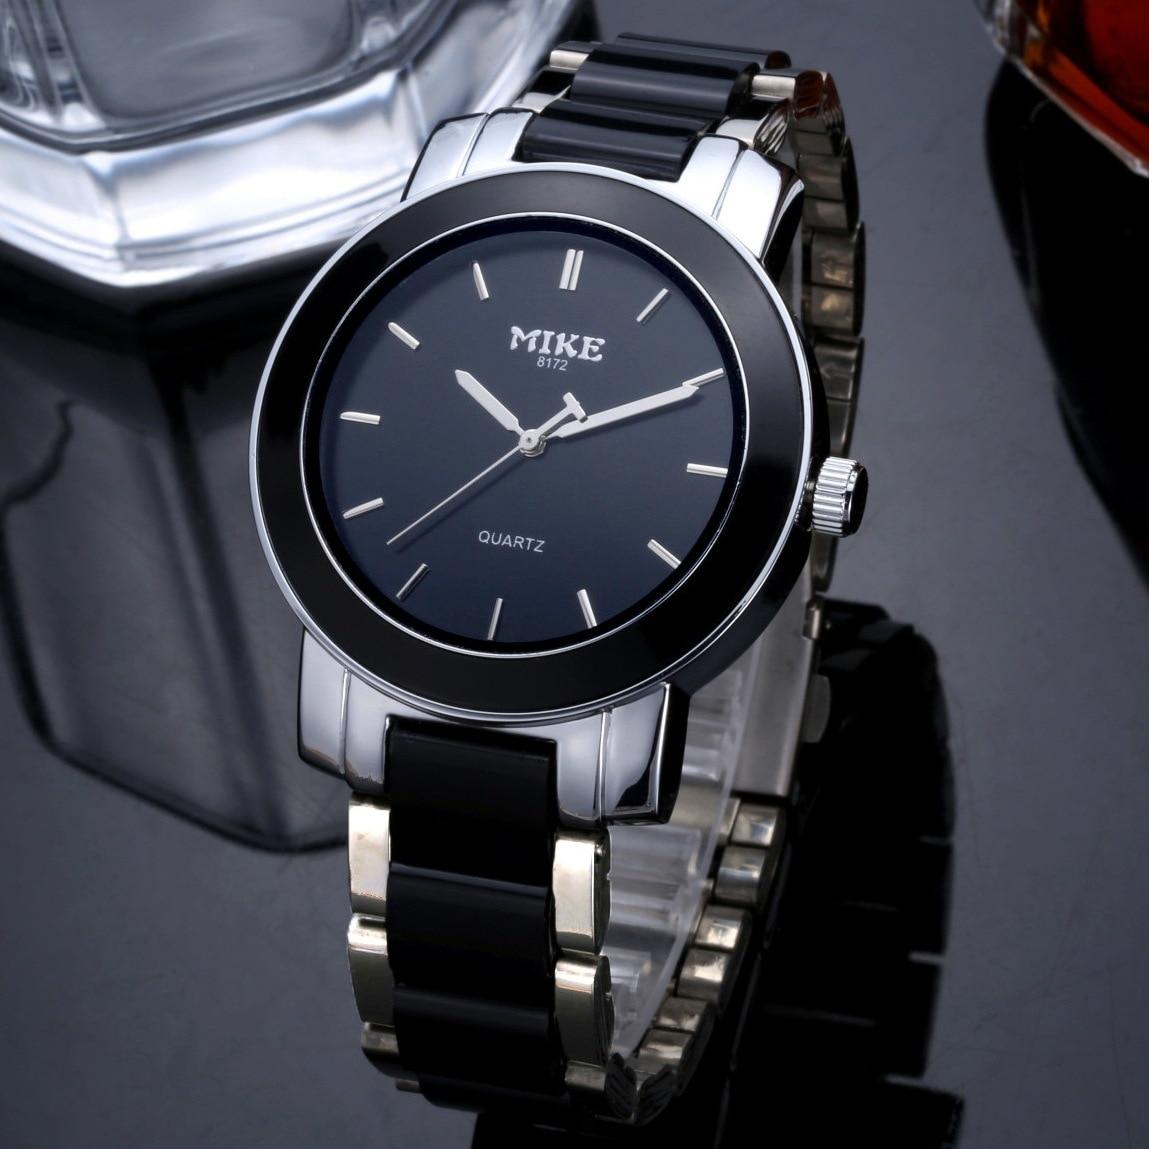 MIKE Quartz Watch Men Ceramic Watches Top Luxury Brand Watch Fashion Waterproof Clock Dress Wrist Watches Relogio Masculino